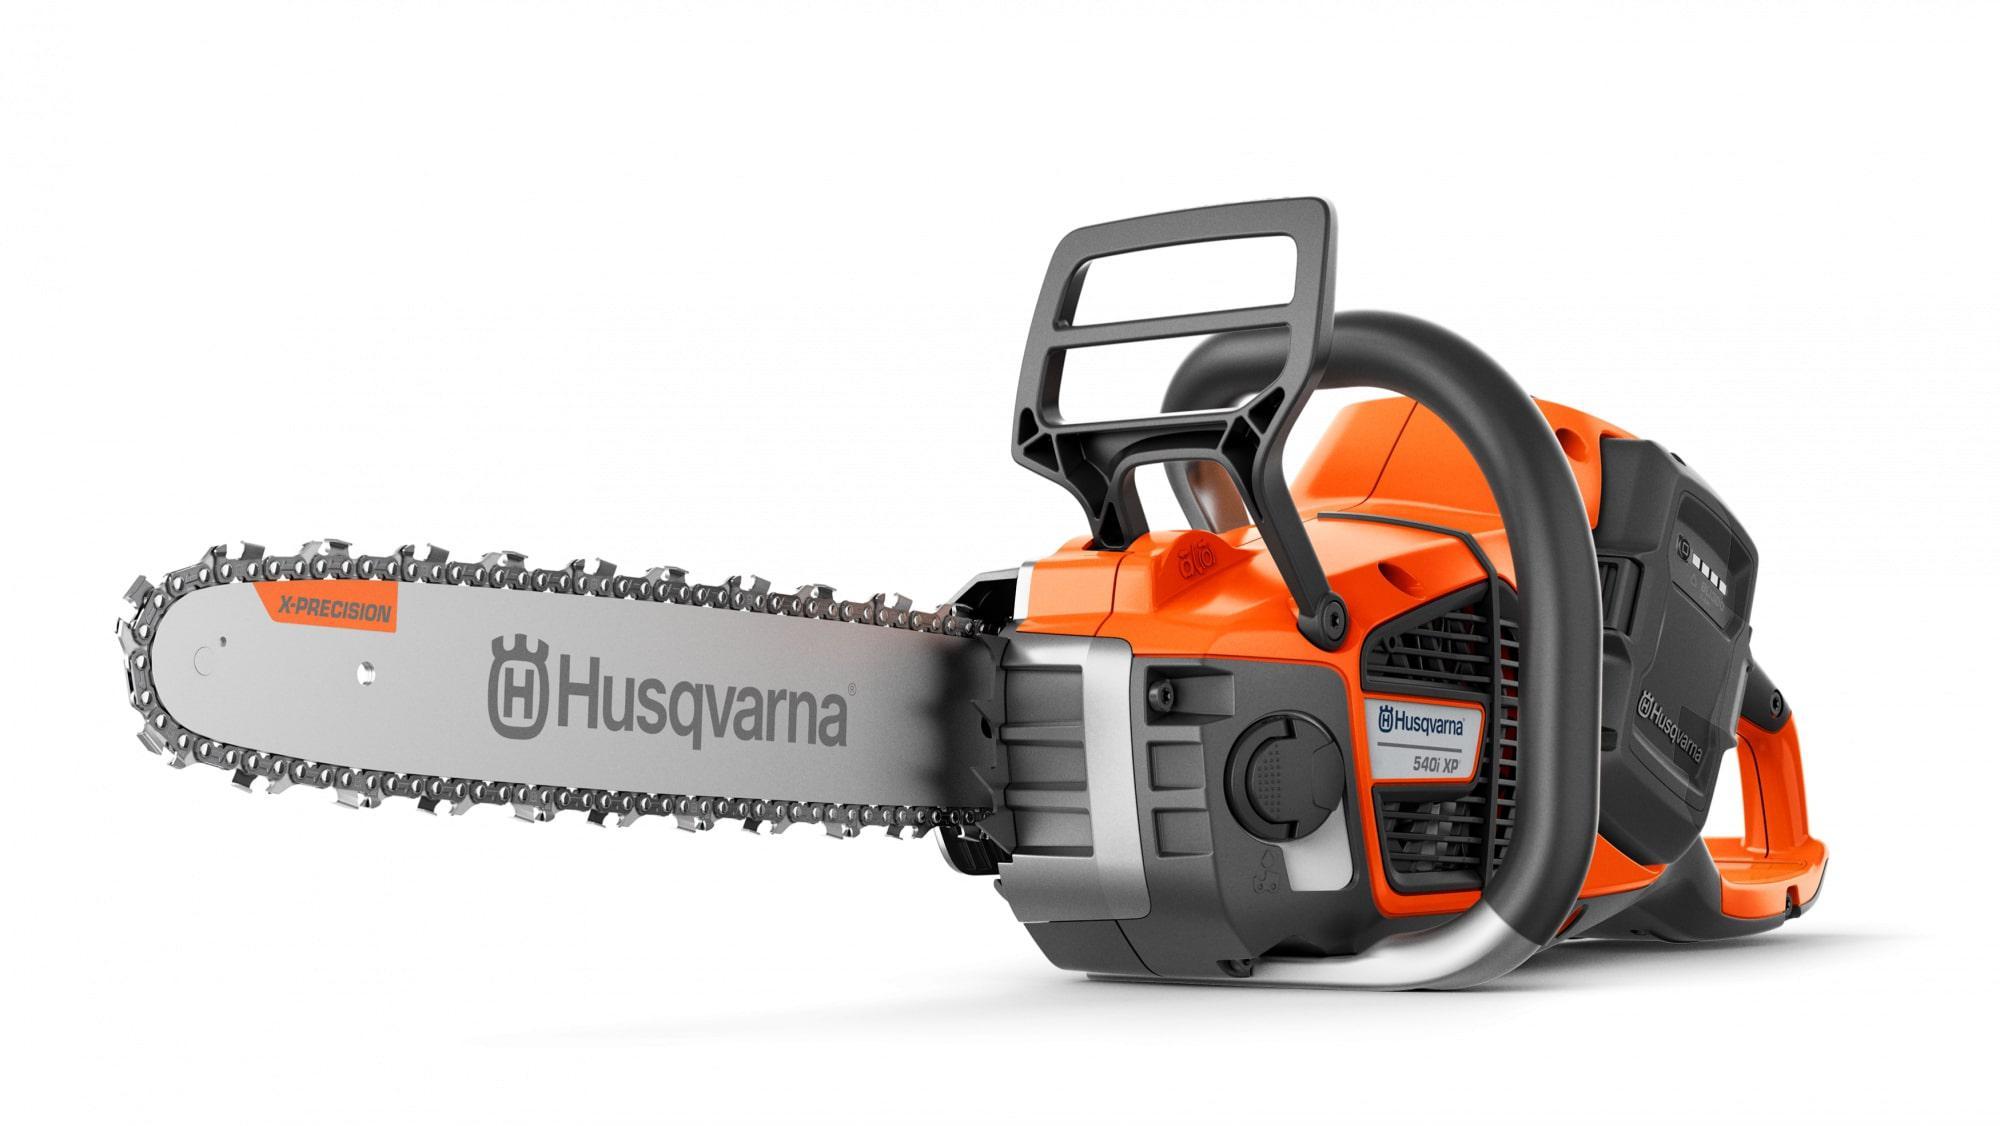 Пила цепная аккумуляторная Husqvarna 540ixp (9679839-14)